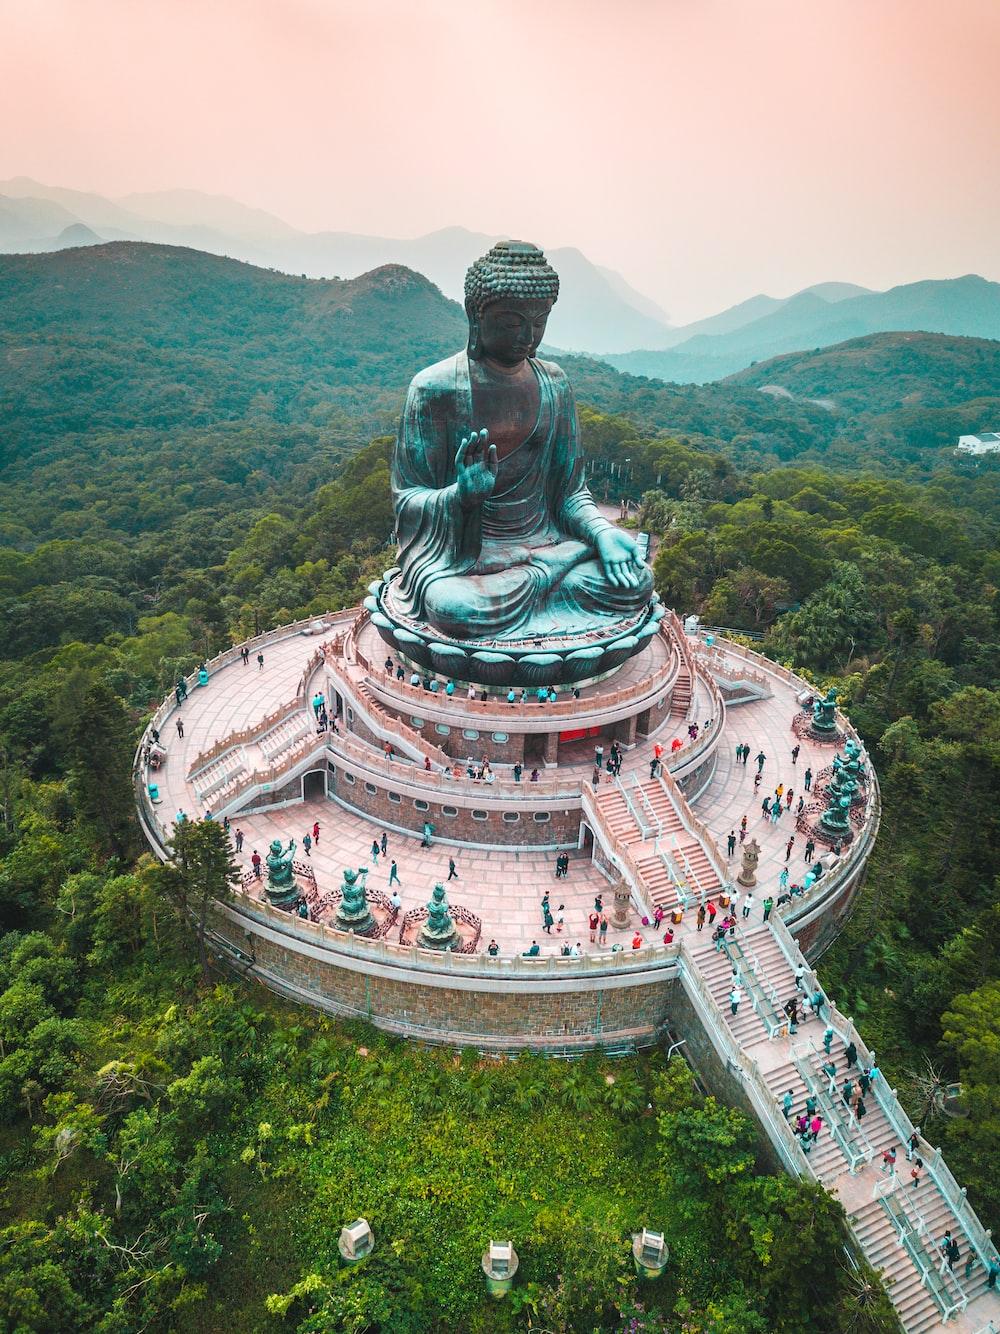 Tian Tan Buddha Hong Kong Pictures Download Free Images On Unsplash